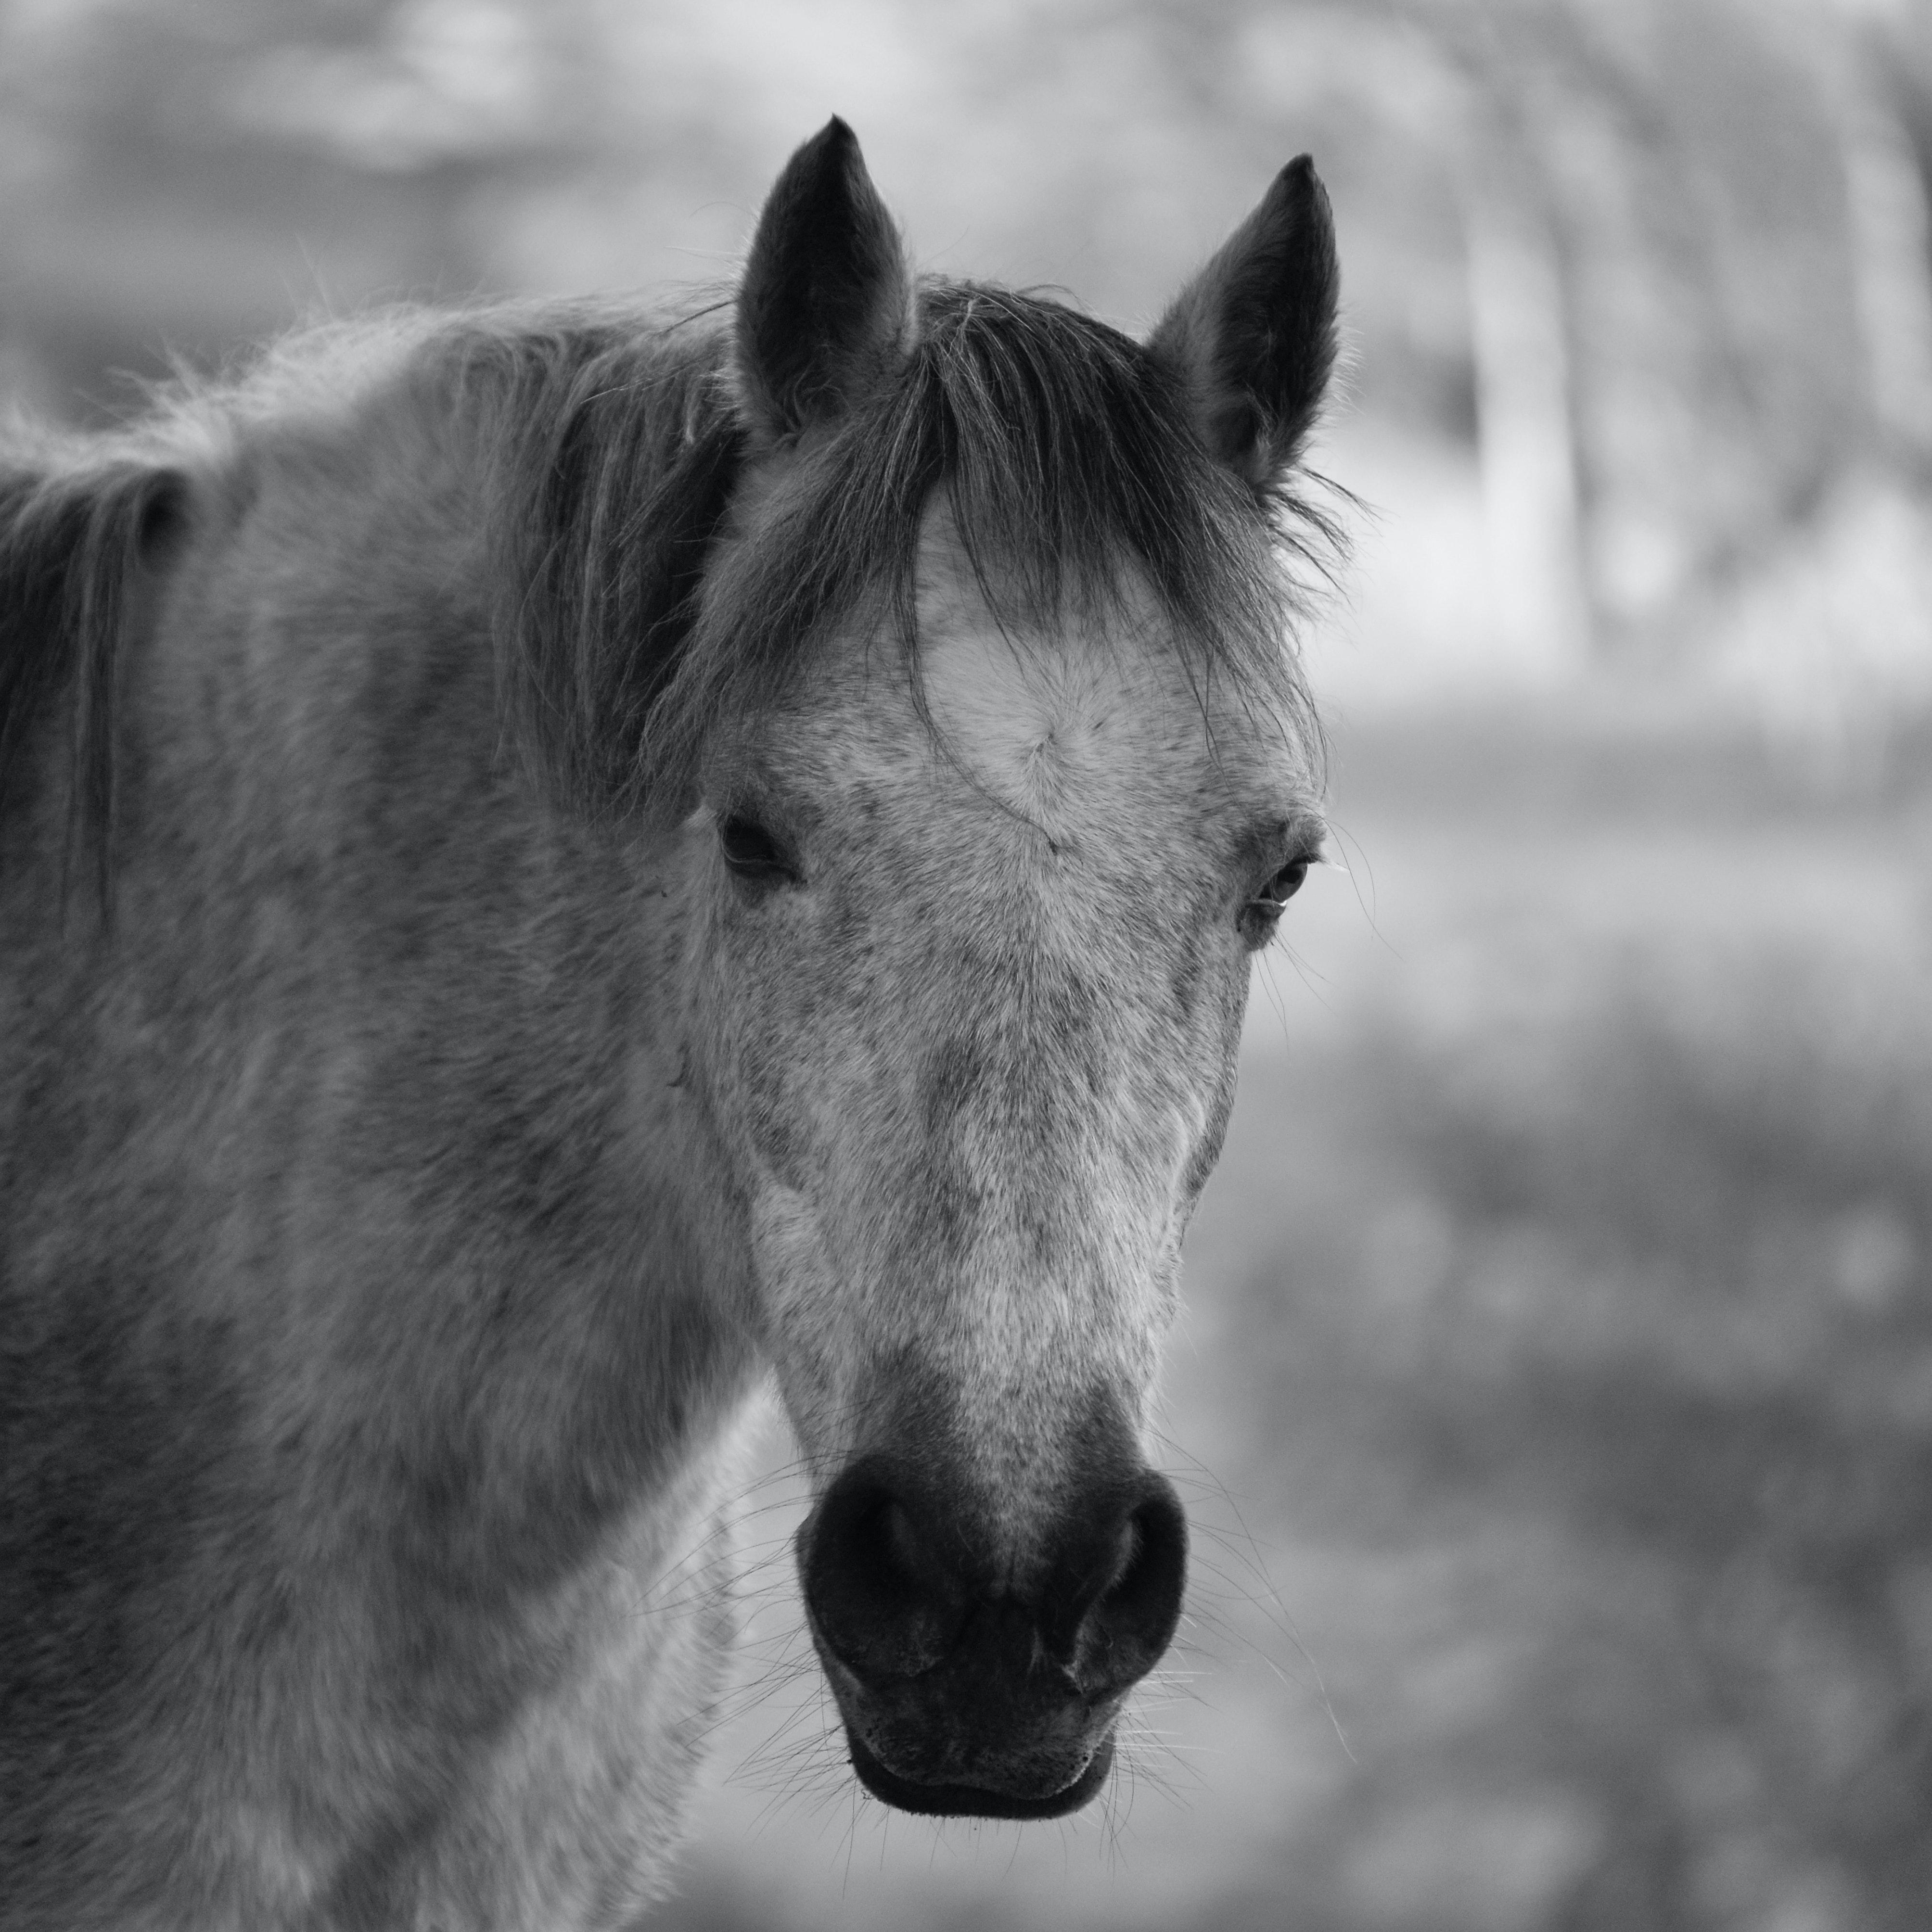 White horse laila klinsmann · horse head grayscale photo hermaion